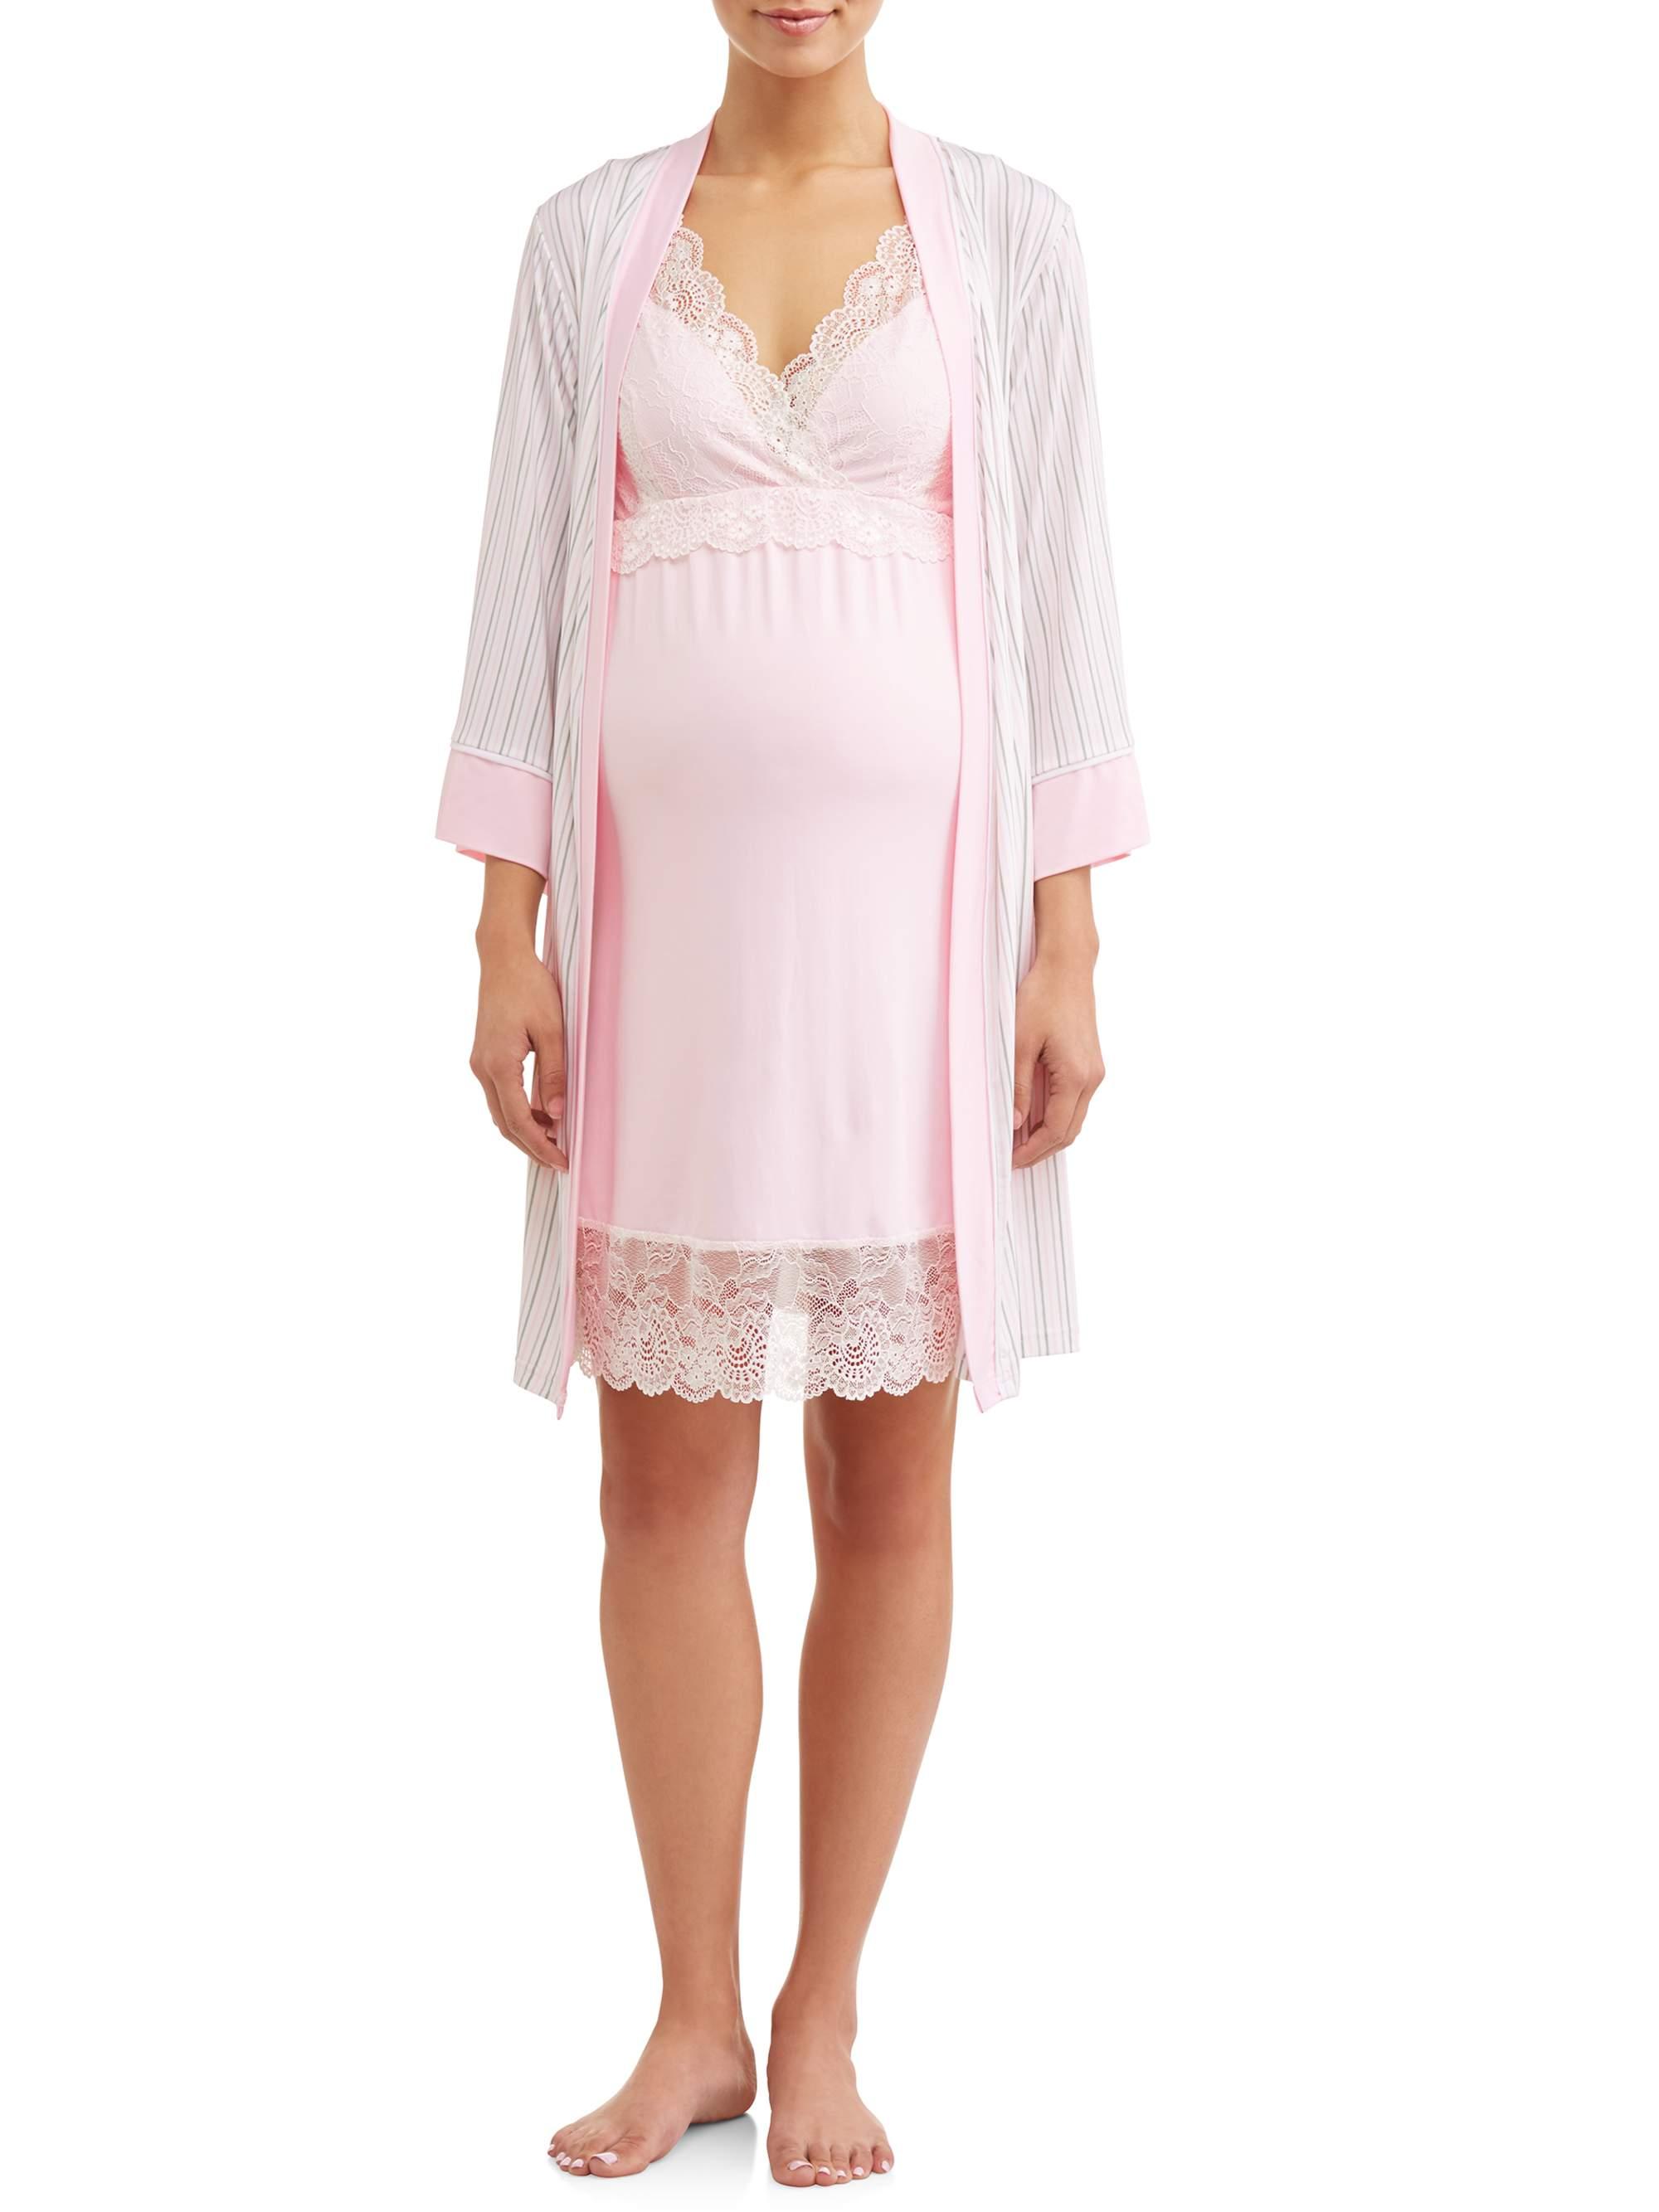 Maternity 2-Piece Nursing Cross Over Chemise and Robe Set